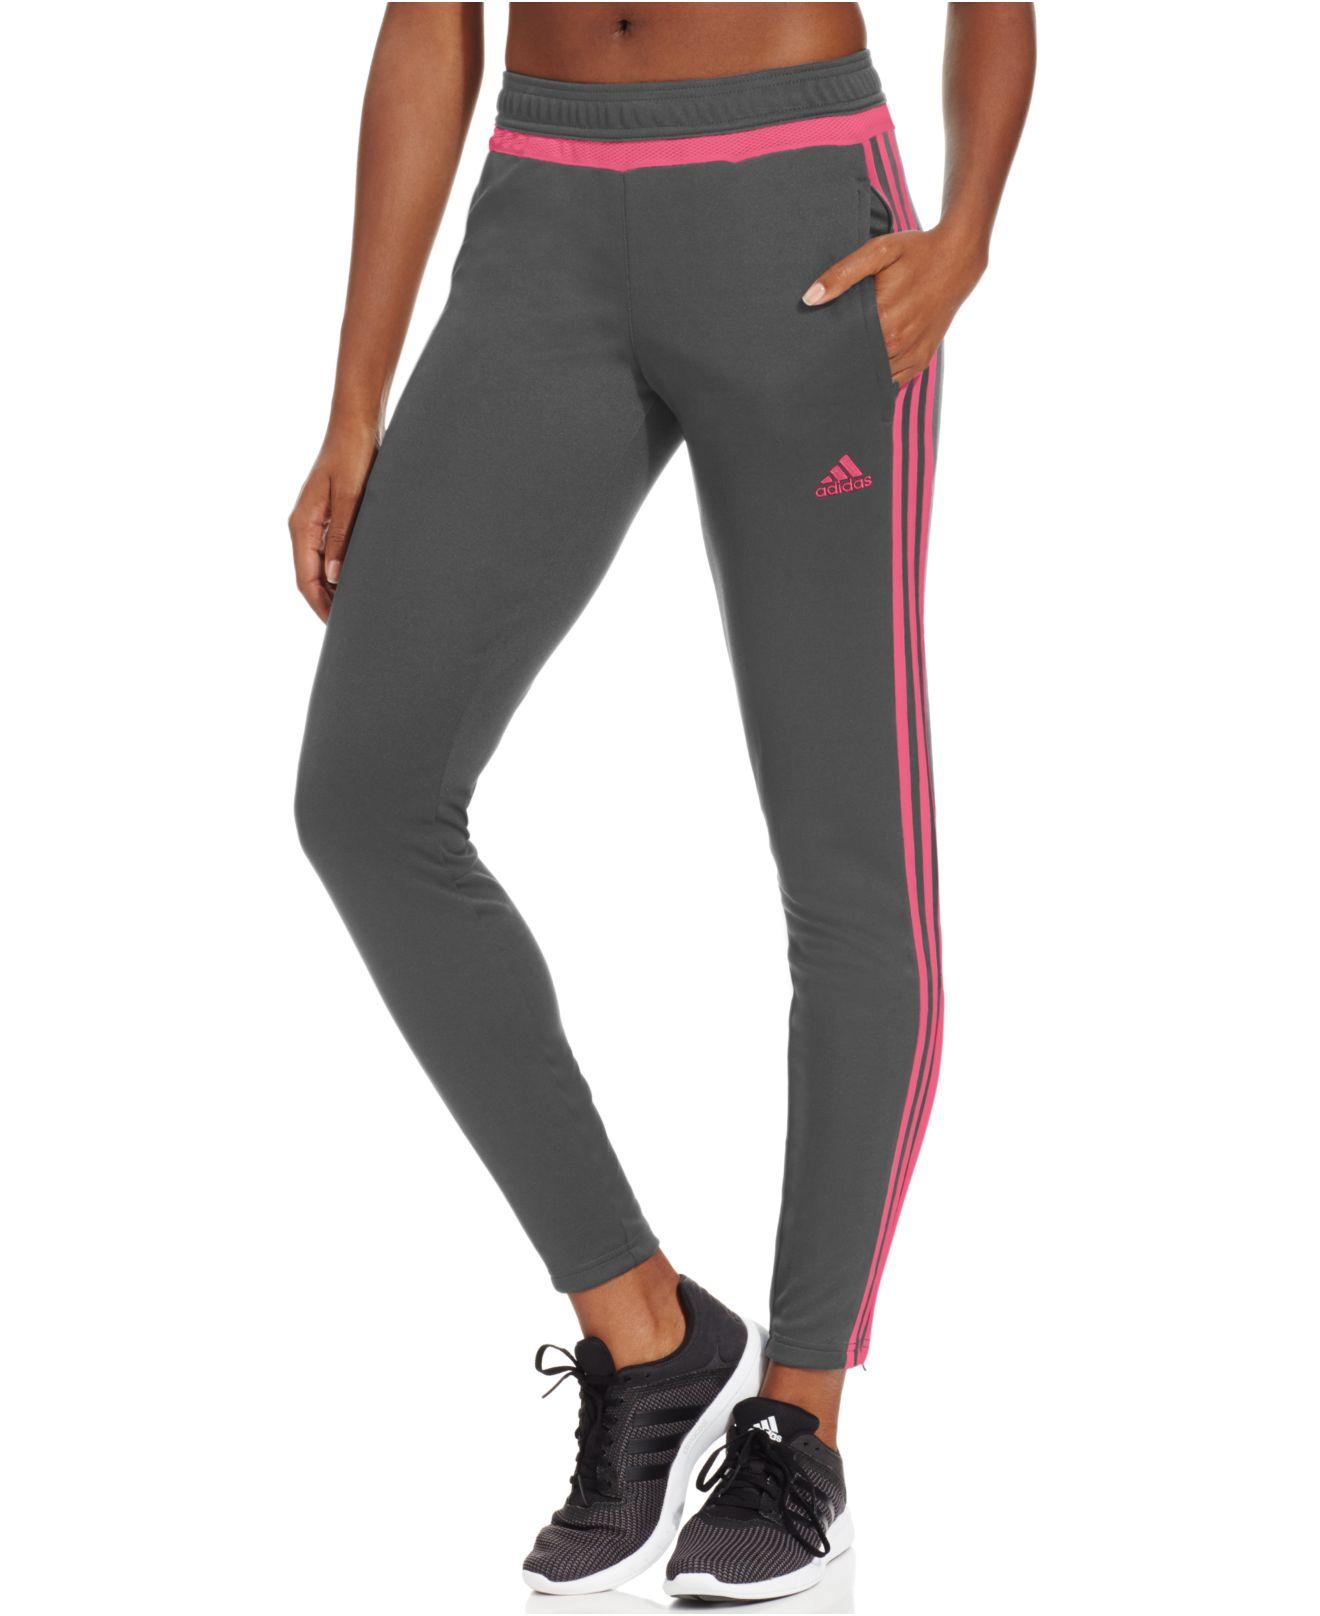 Adidas Originals Tiro 15 Climacool Training Pants In Gray